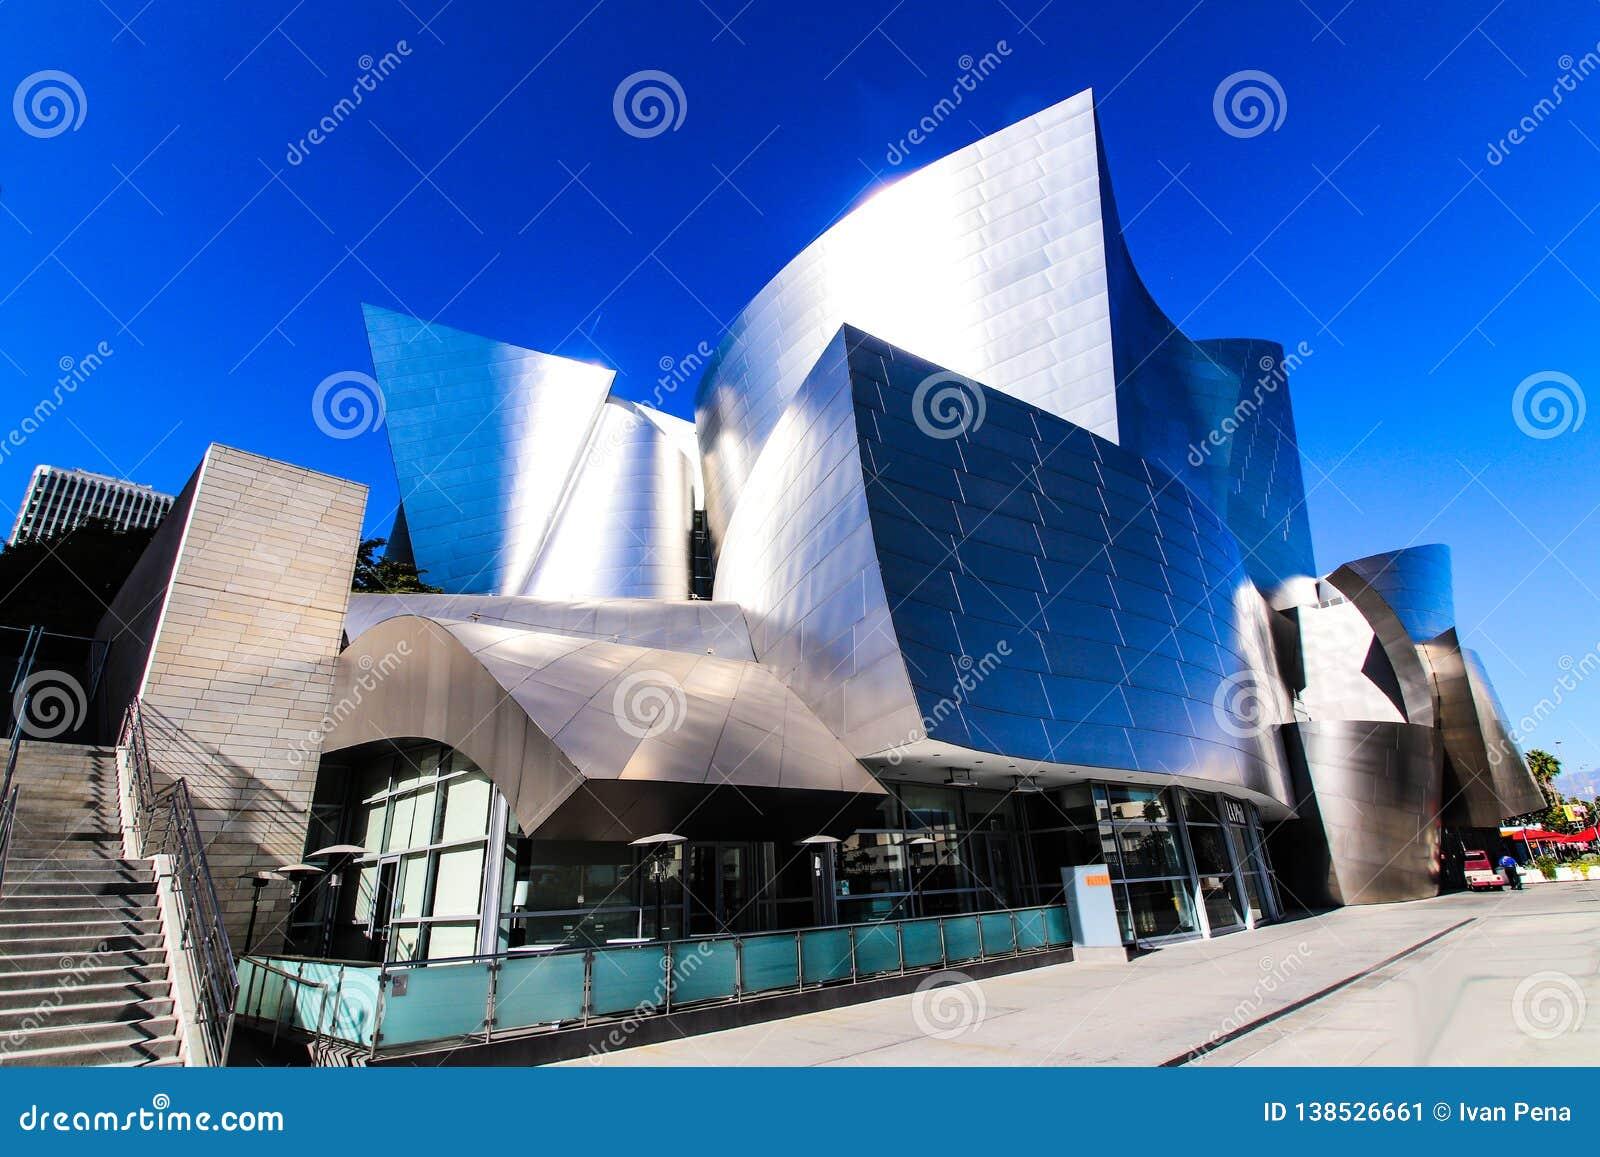 Walt Disney Concert Hall in Downtown Los Angeles. California